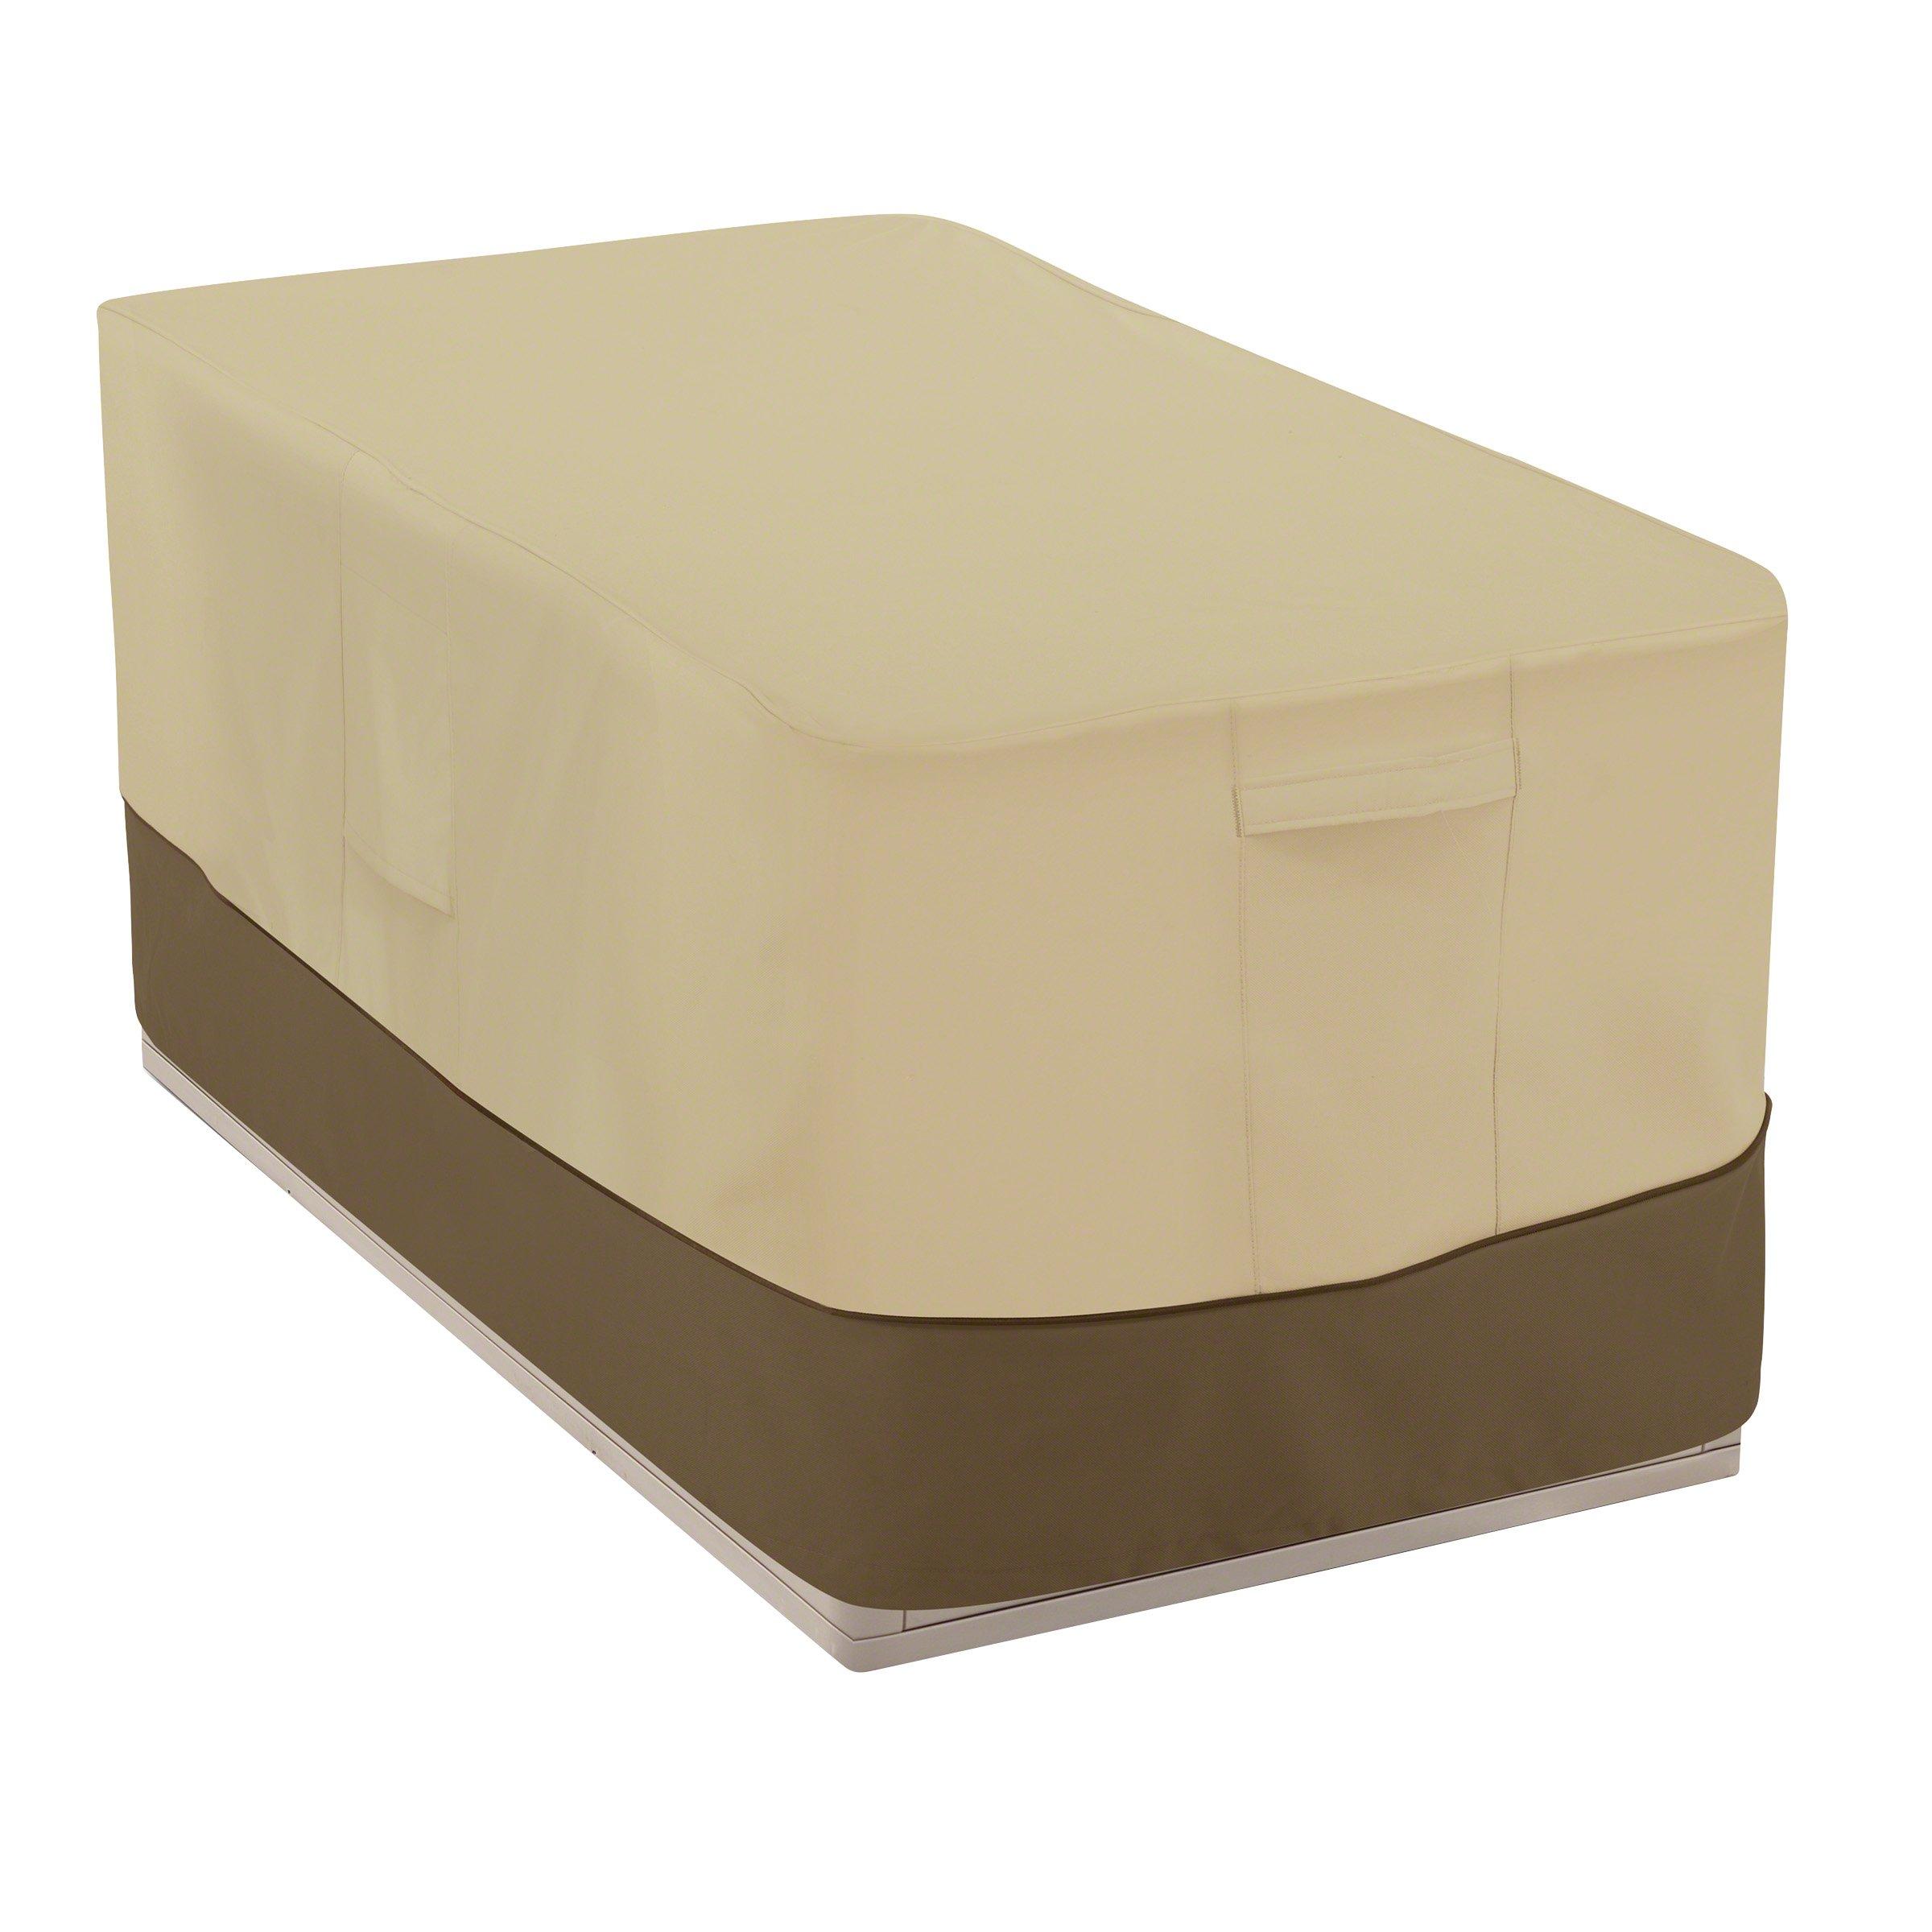 Classic Accessories Veranda Patio Deck Box Cover - Durable and Water-Resistant Patio Furniture Cover, 55-Inch (55-706-011501-00)